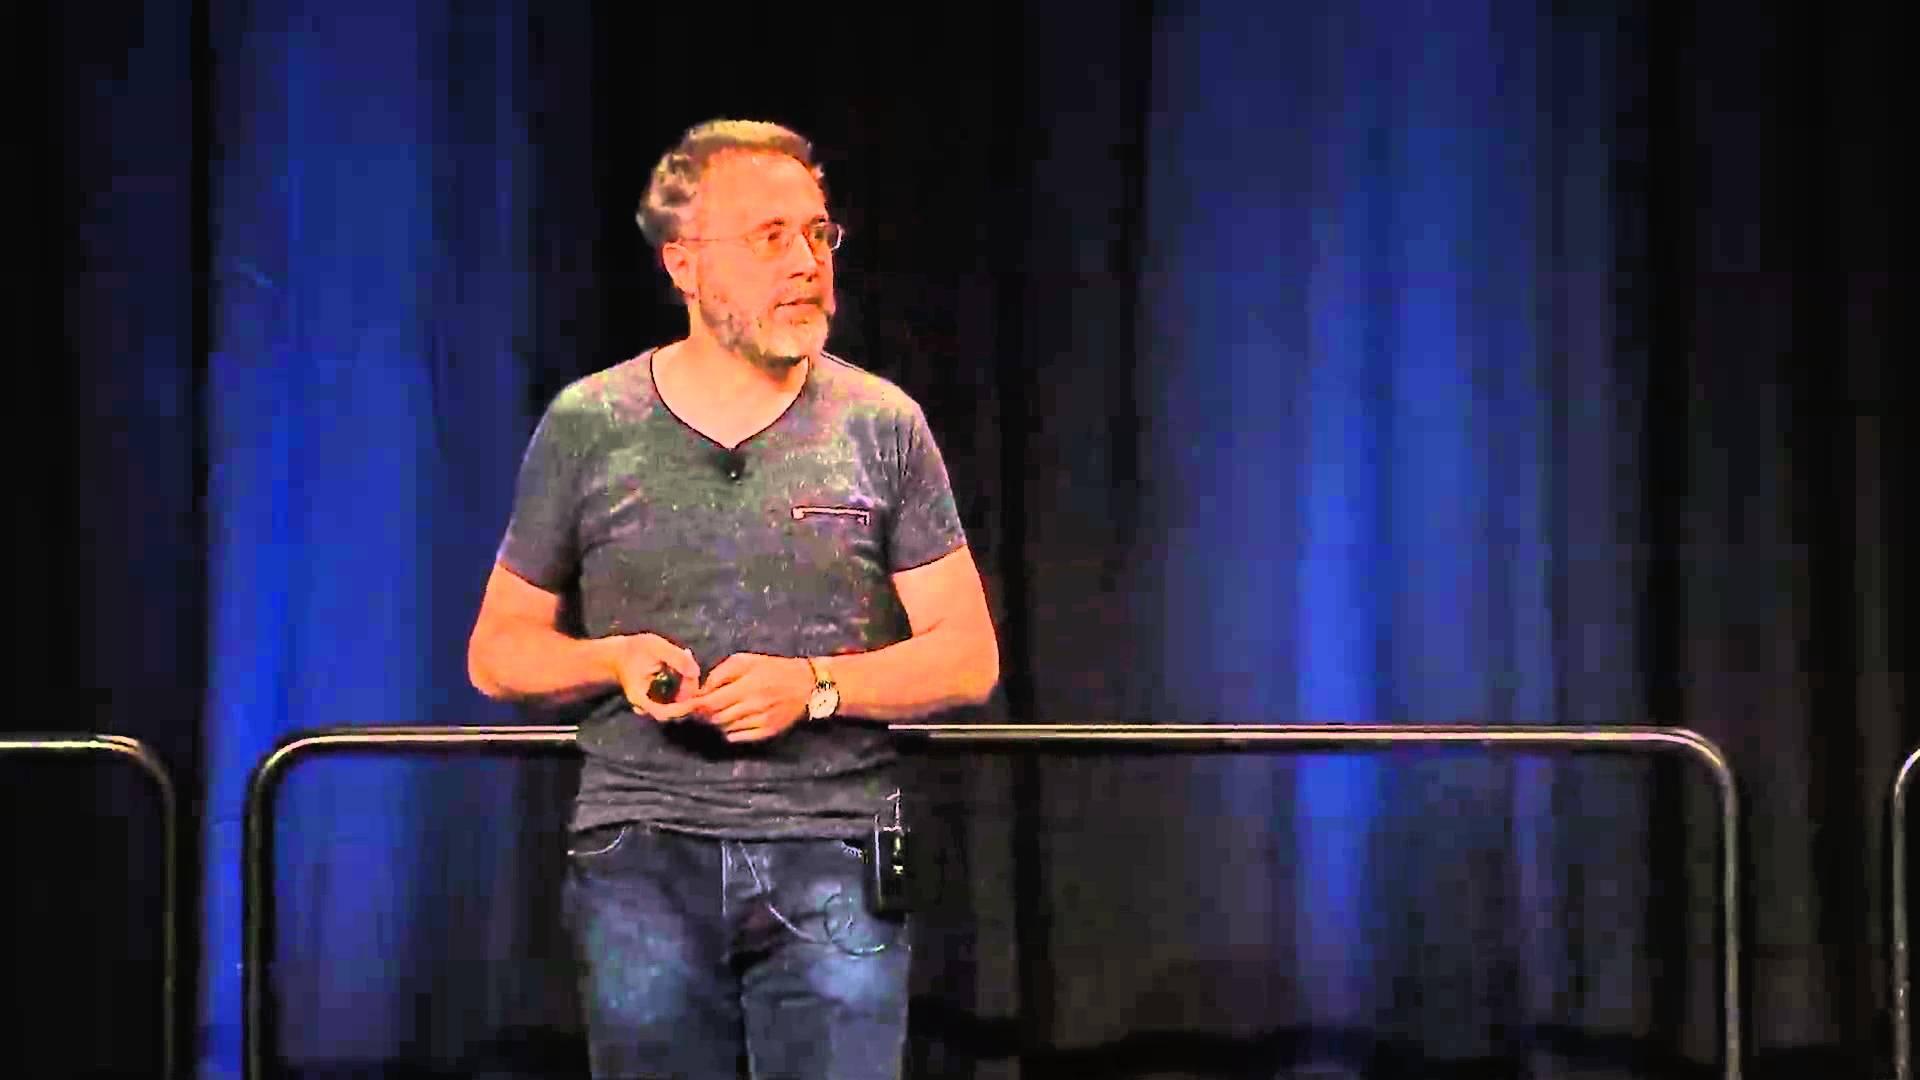 Google Cloud Platform: Ushering in the Next Generation of Cloud Computing